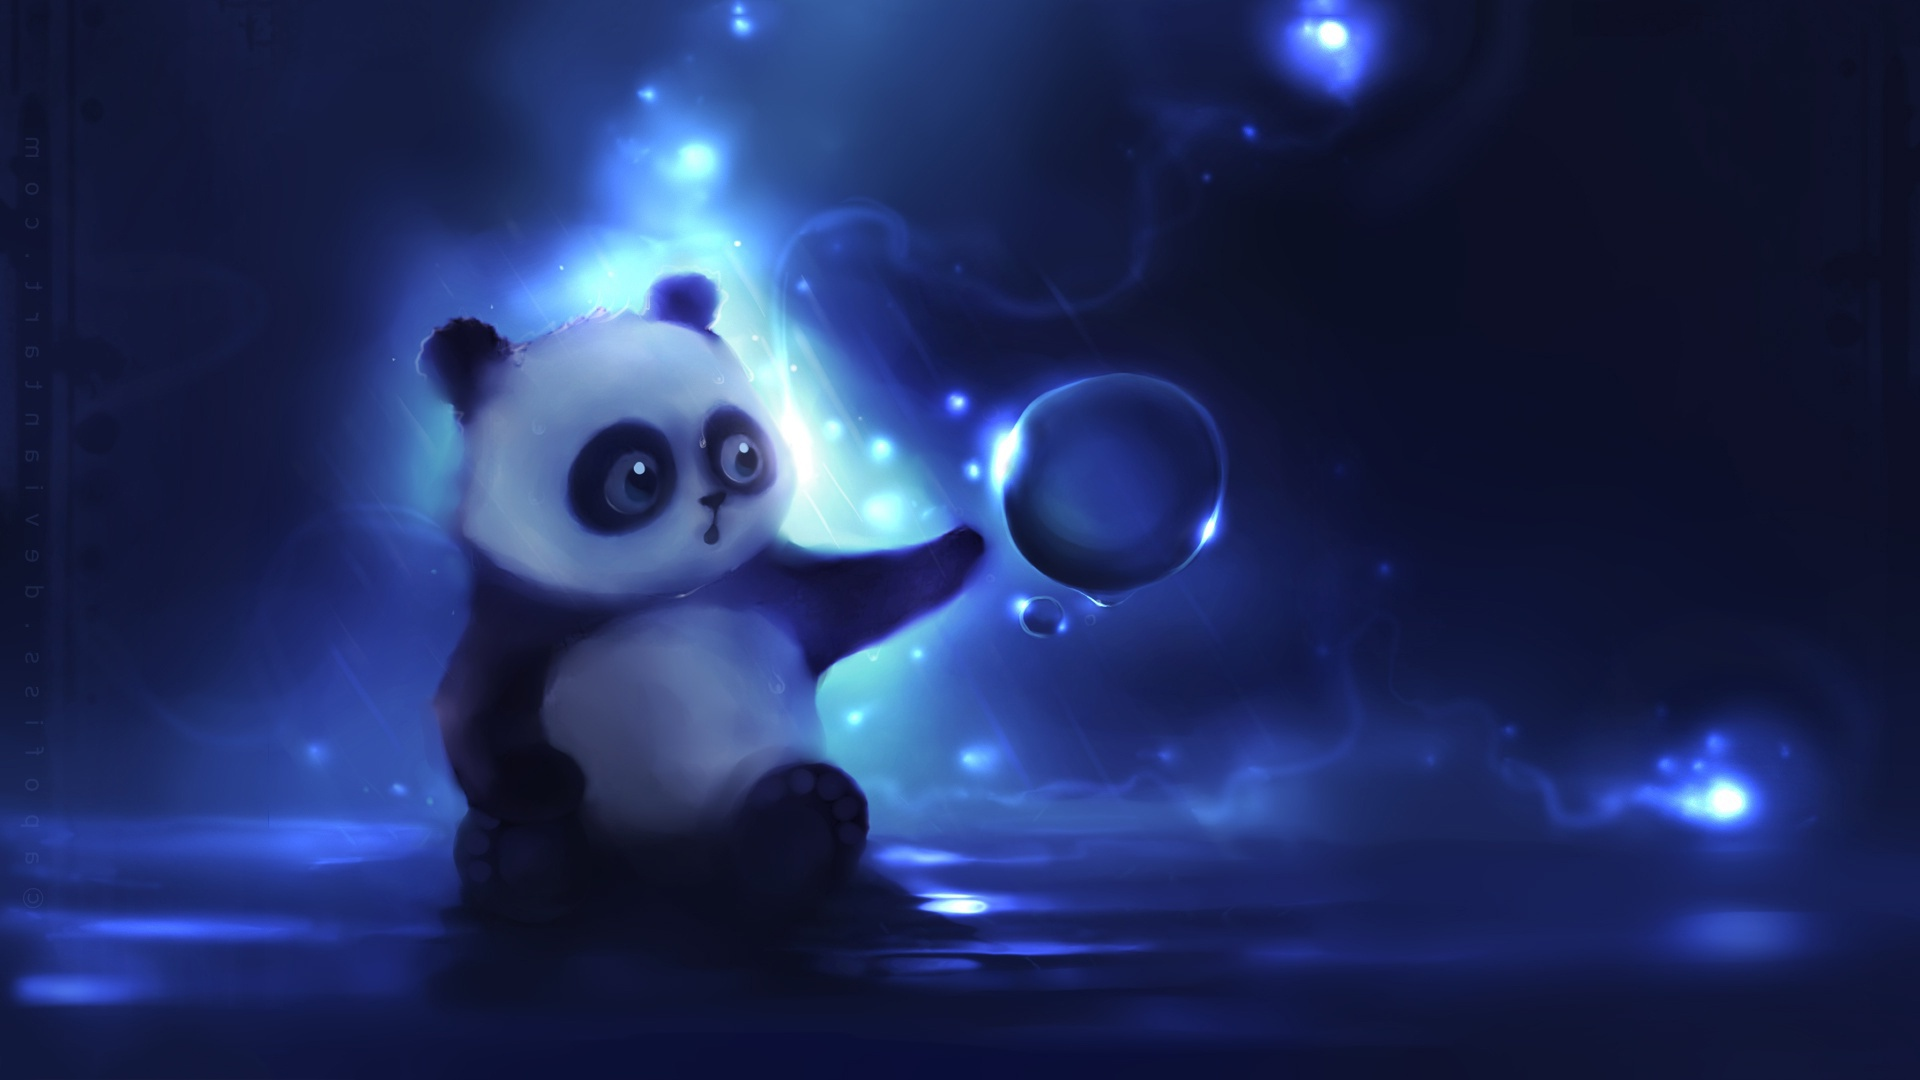 Hd Wallpapers O Panda Wallpaper Hd Hd Wallpapermonkey Panda Wallpapers